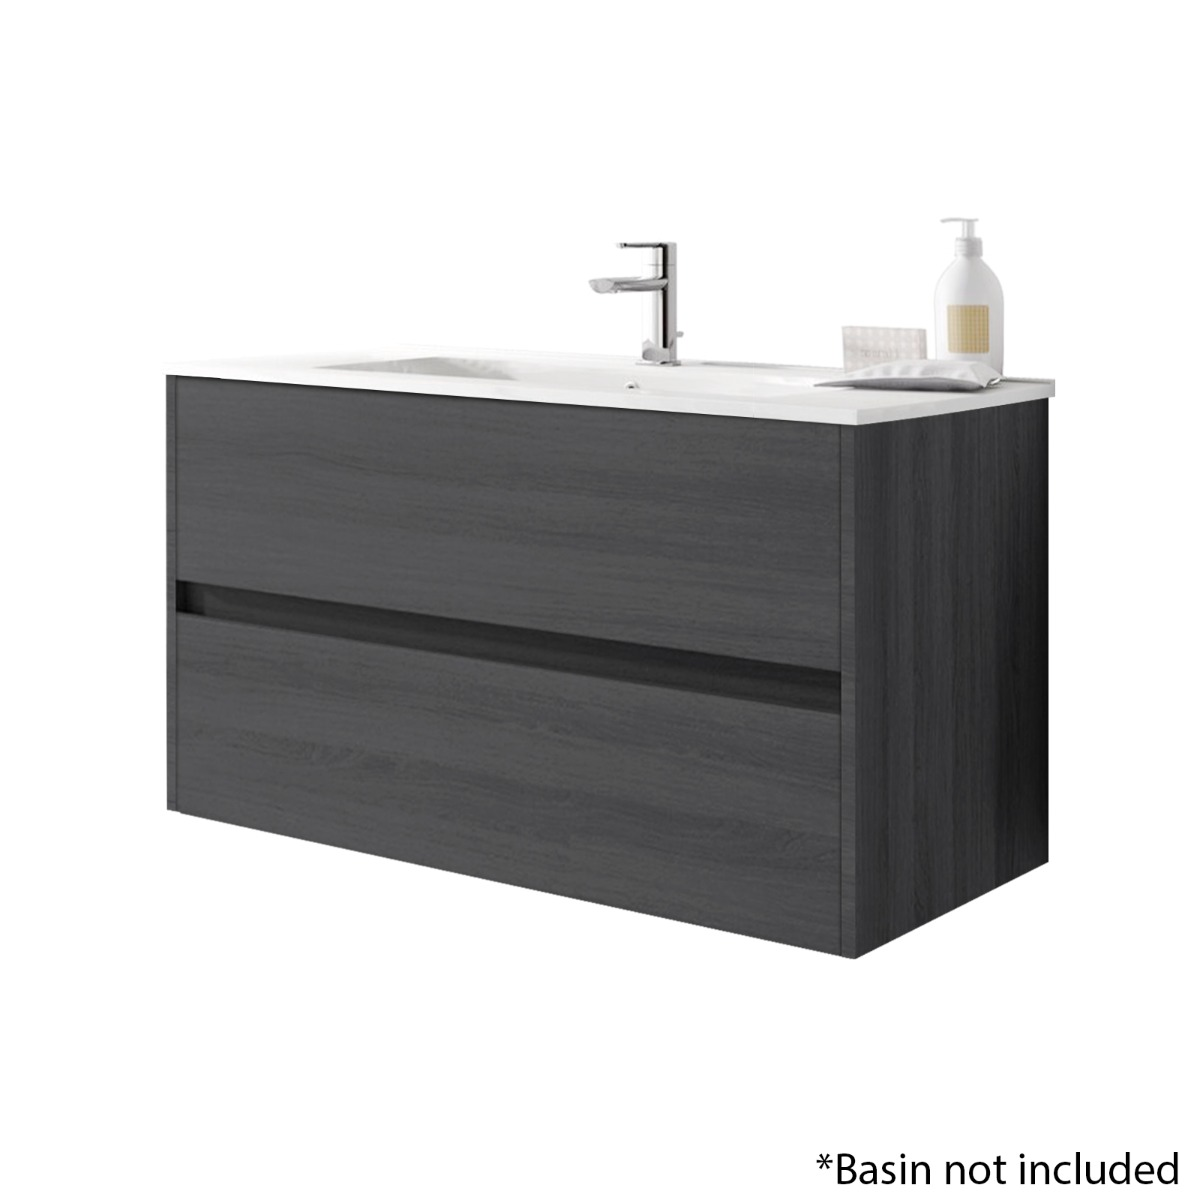 Alba 100cm 2 Drawer Basin Unit in Grey Oak